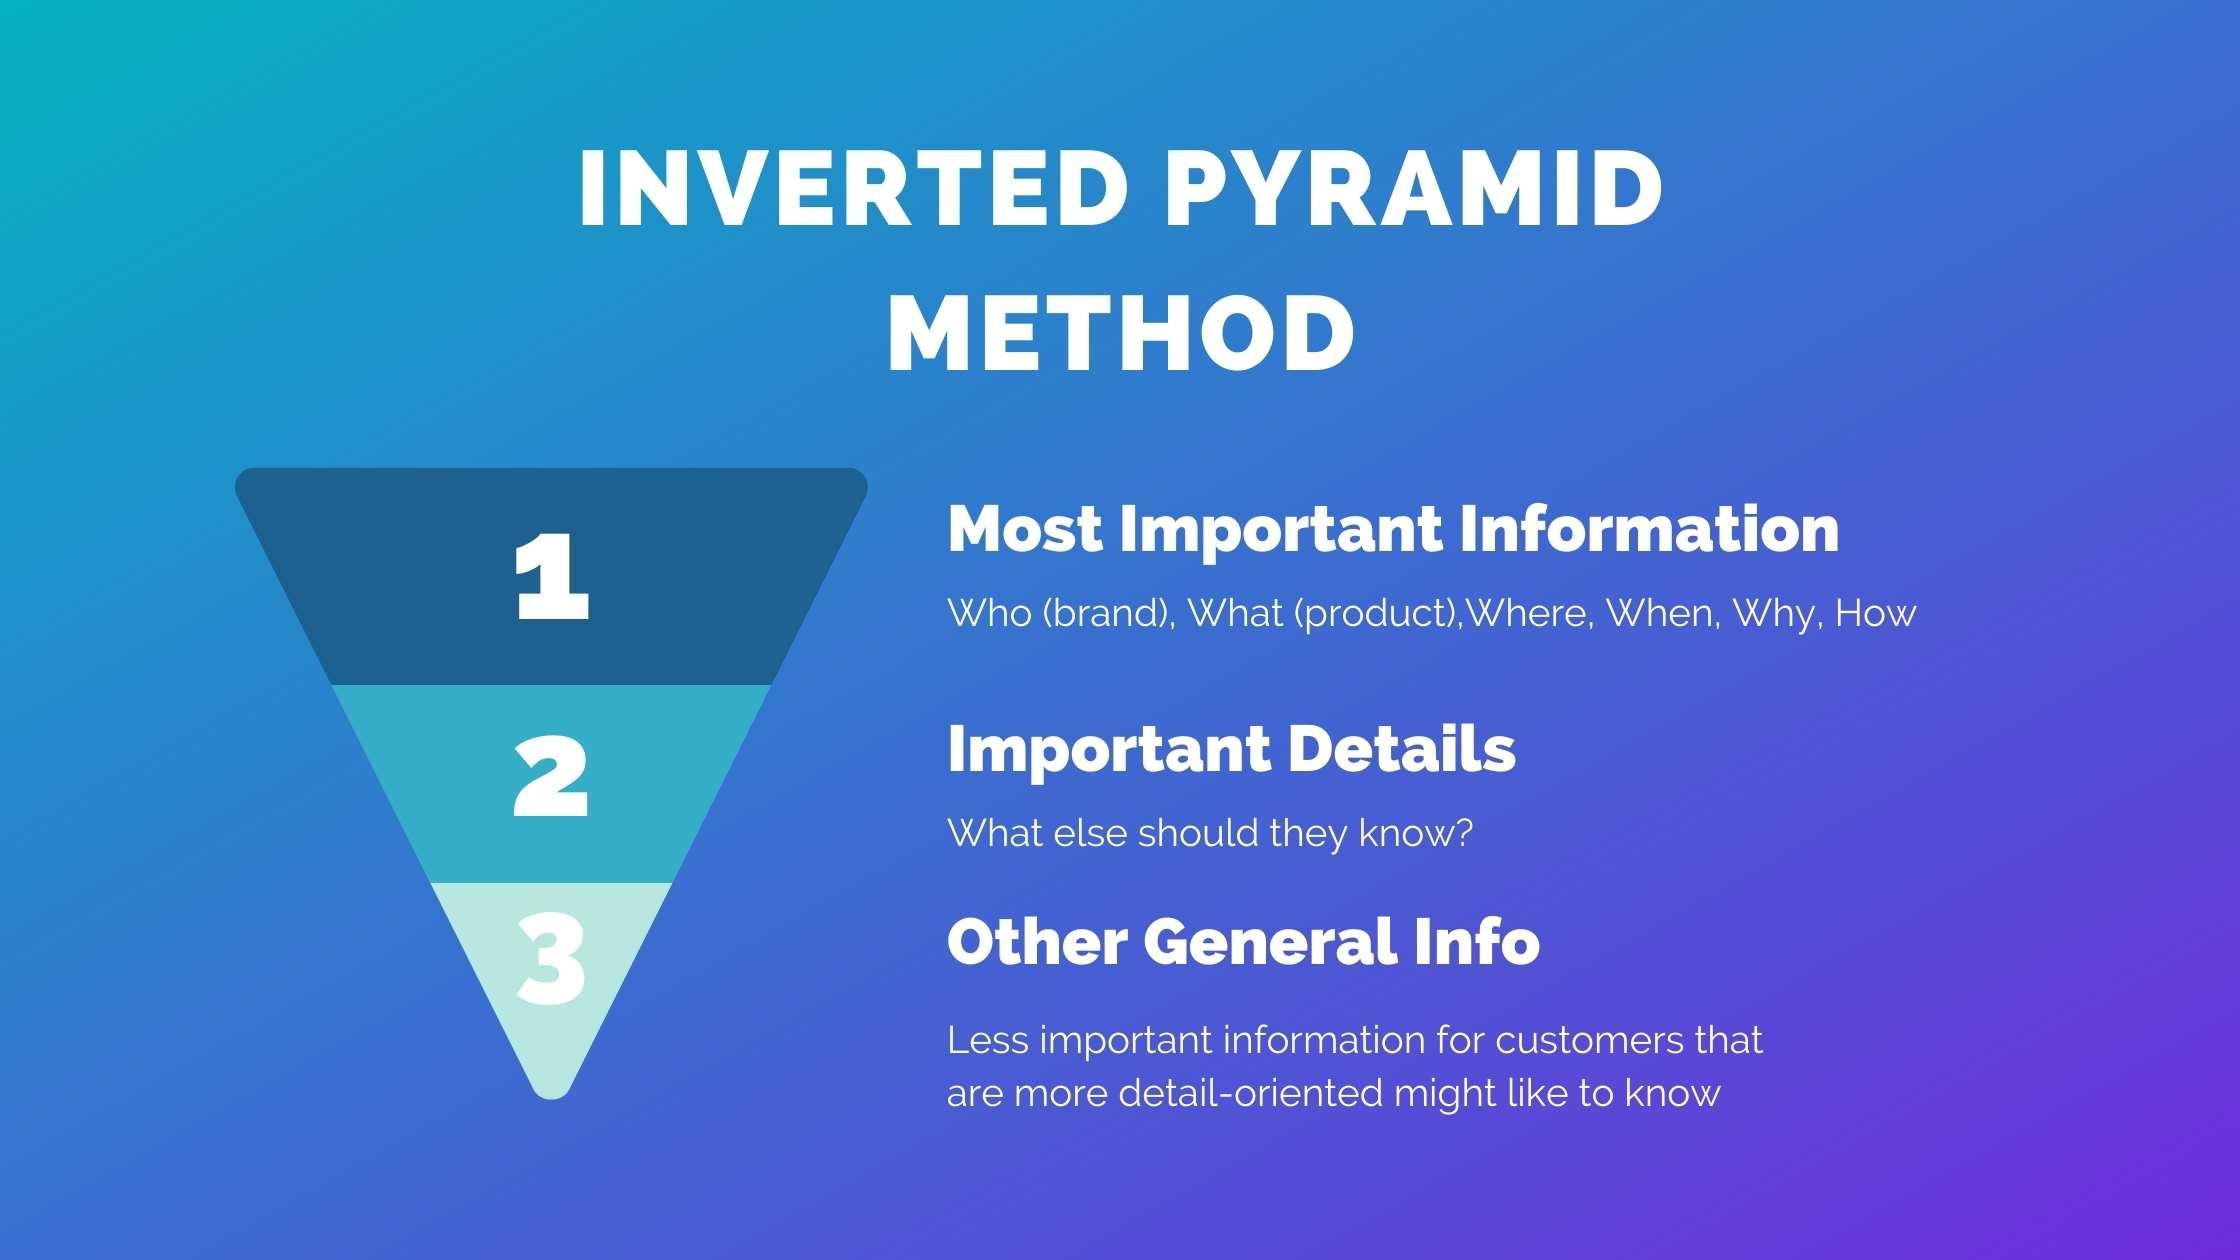 Inverted pyramid method for copywriting on Amazon